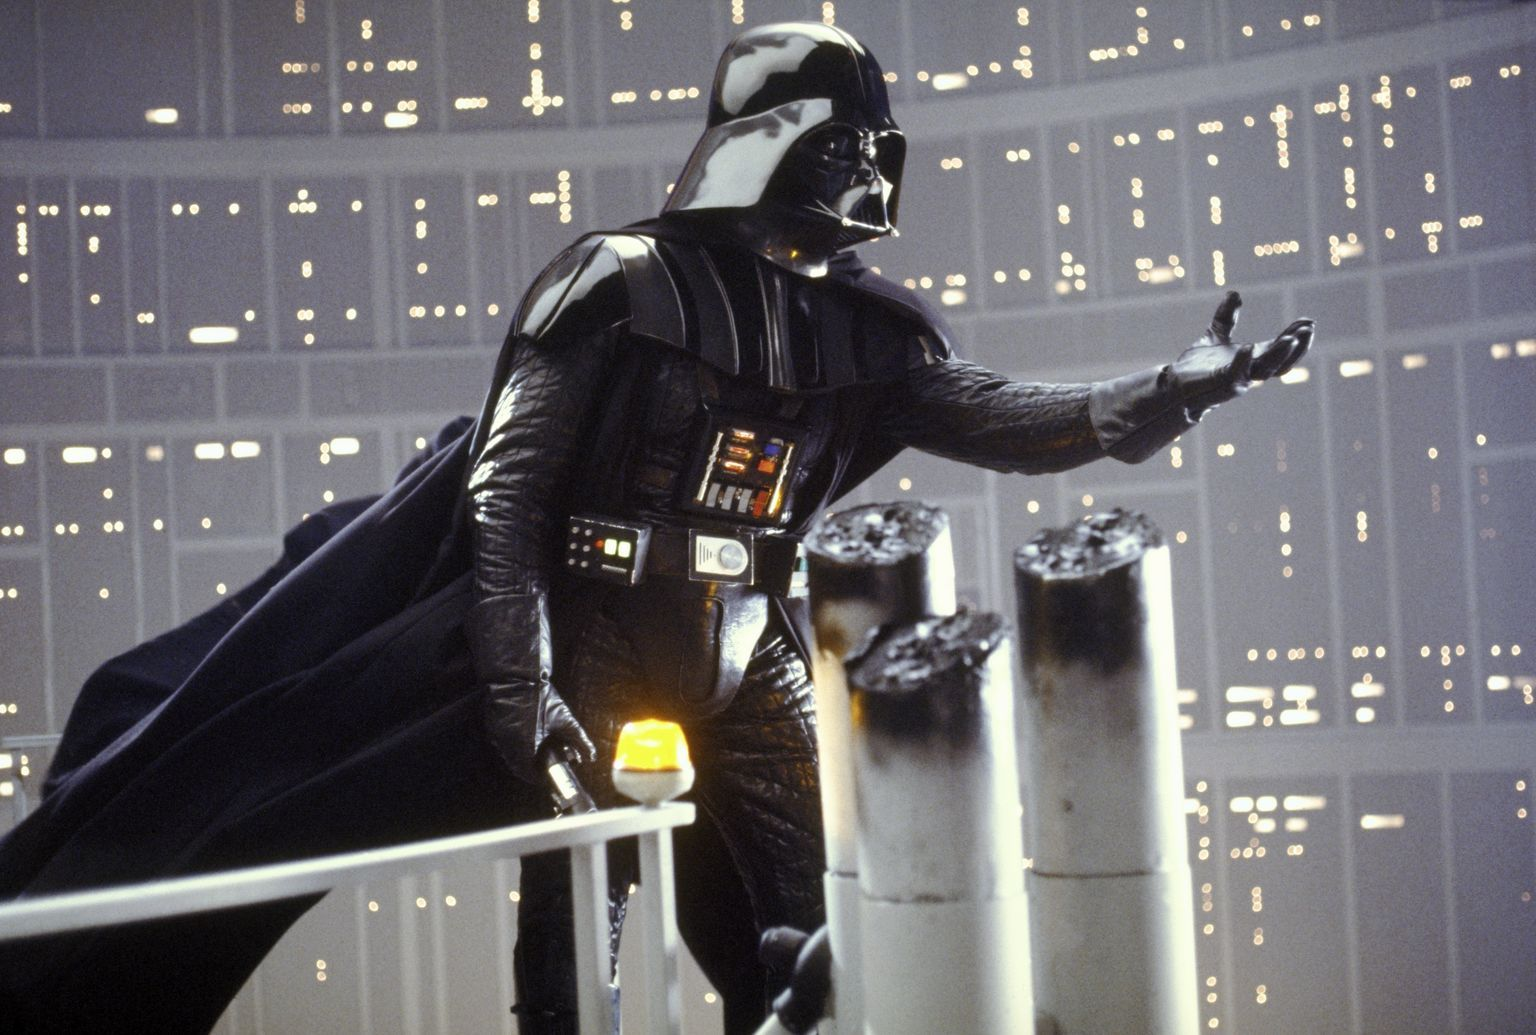 Star Wars Episode V The Empire Strikes Back 1980 Photo